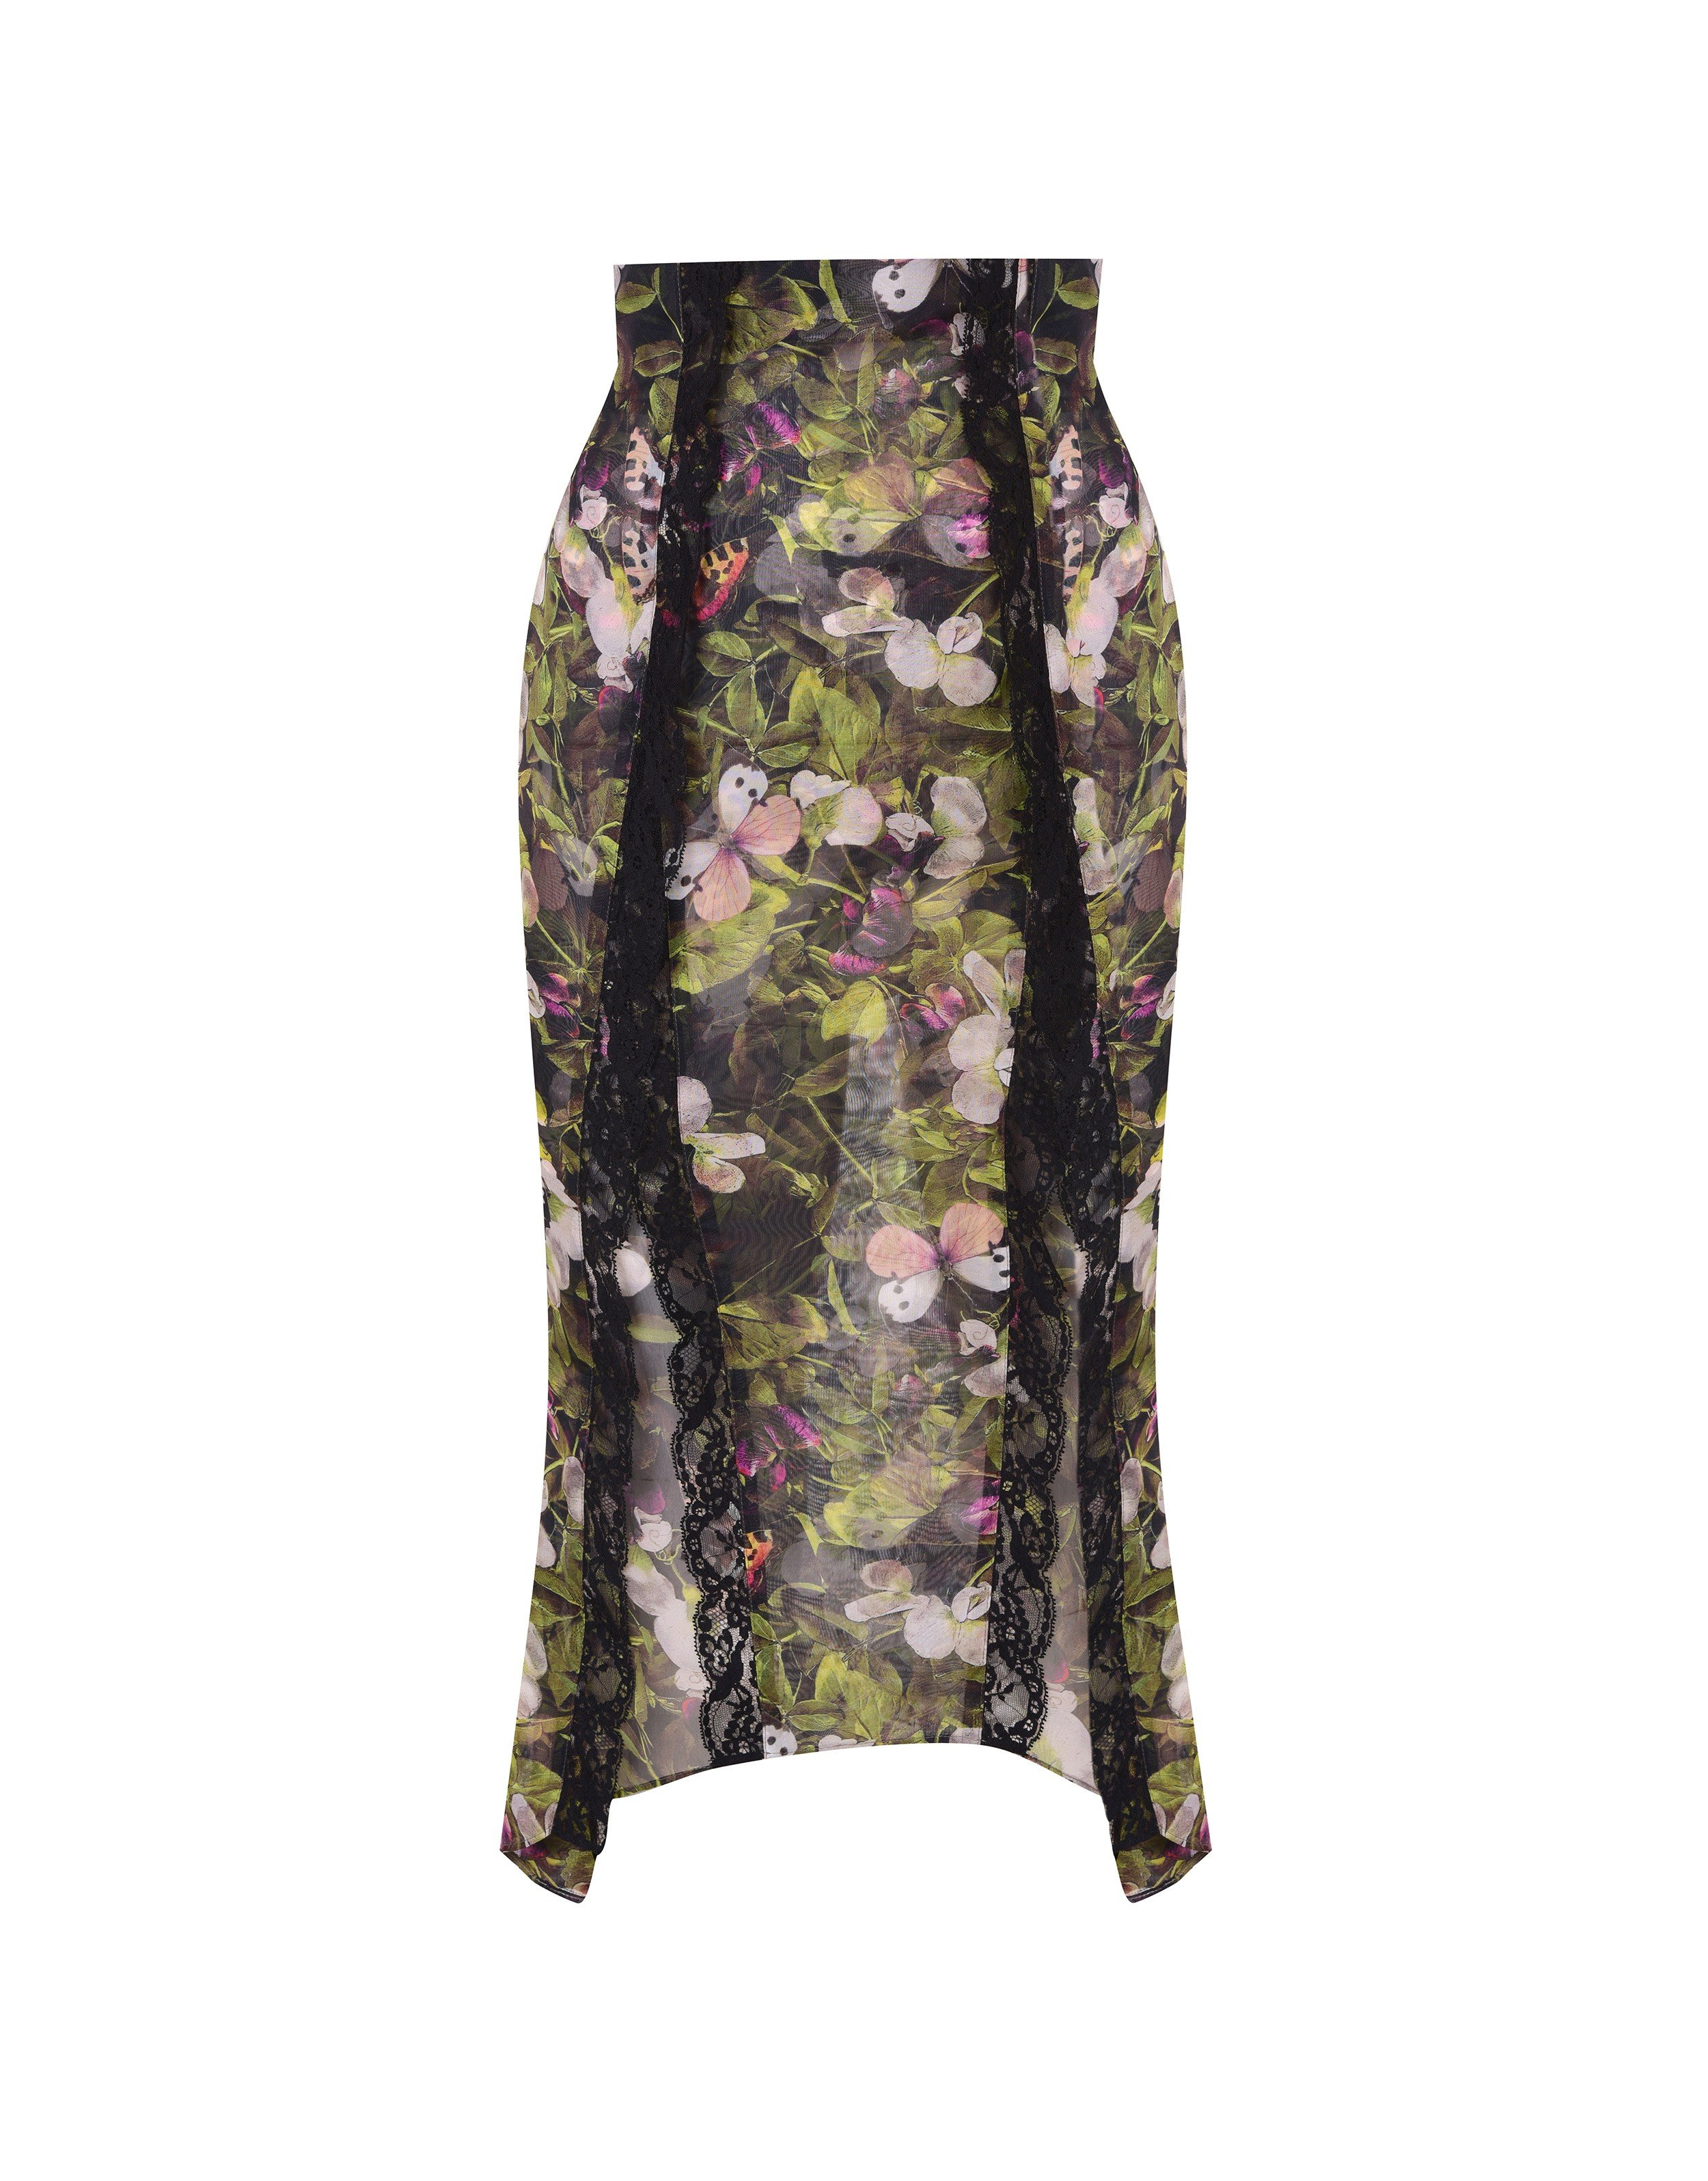 Agent Provocateur Annelise Skirt Multicoloured